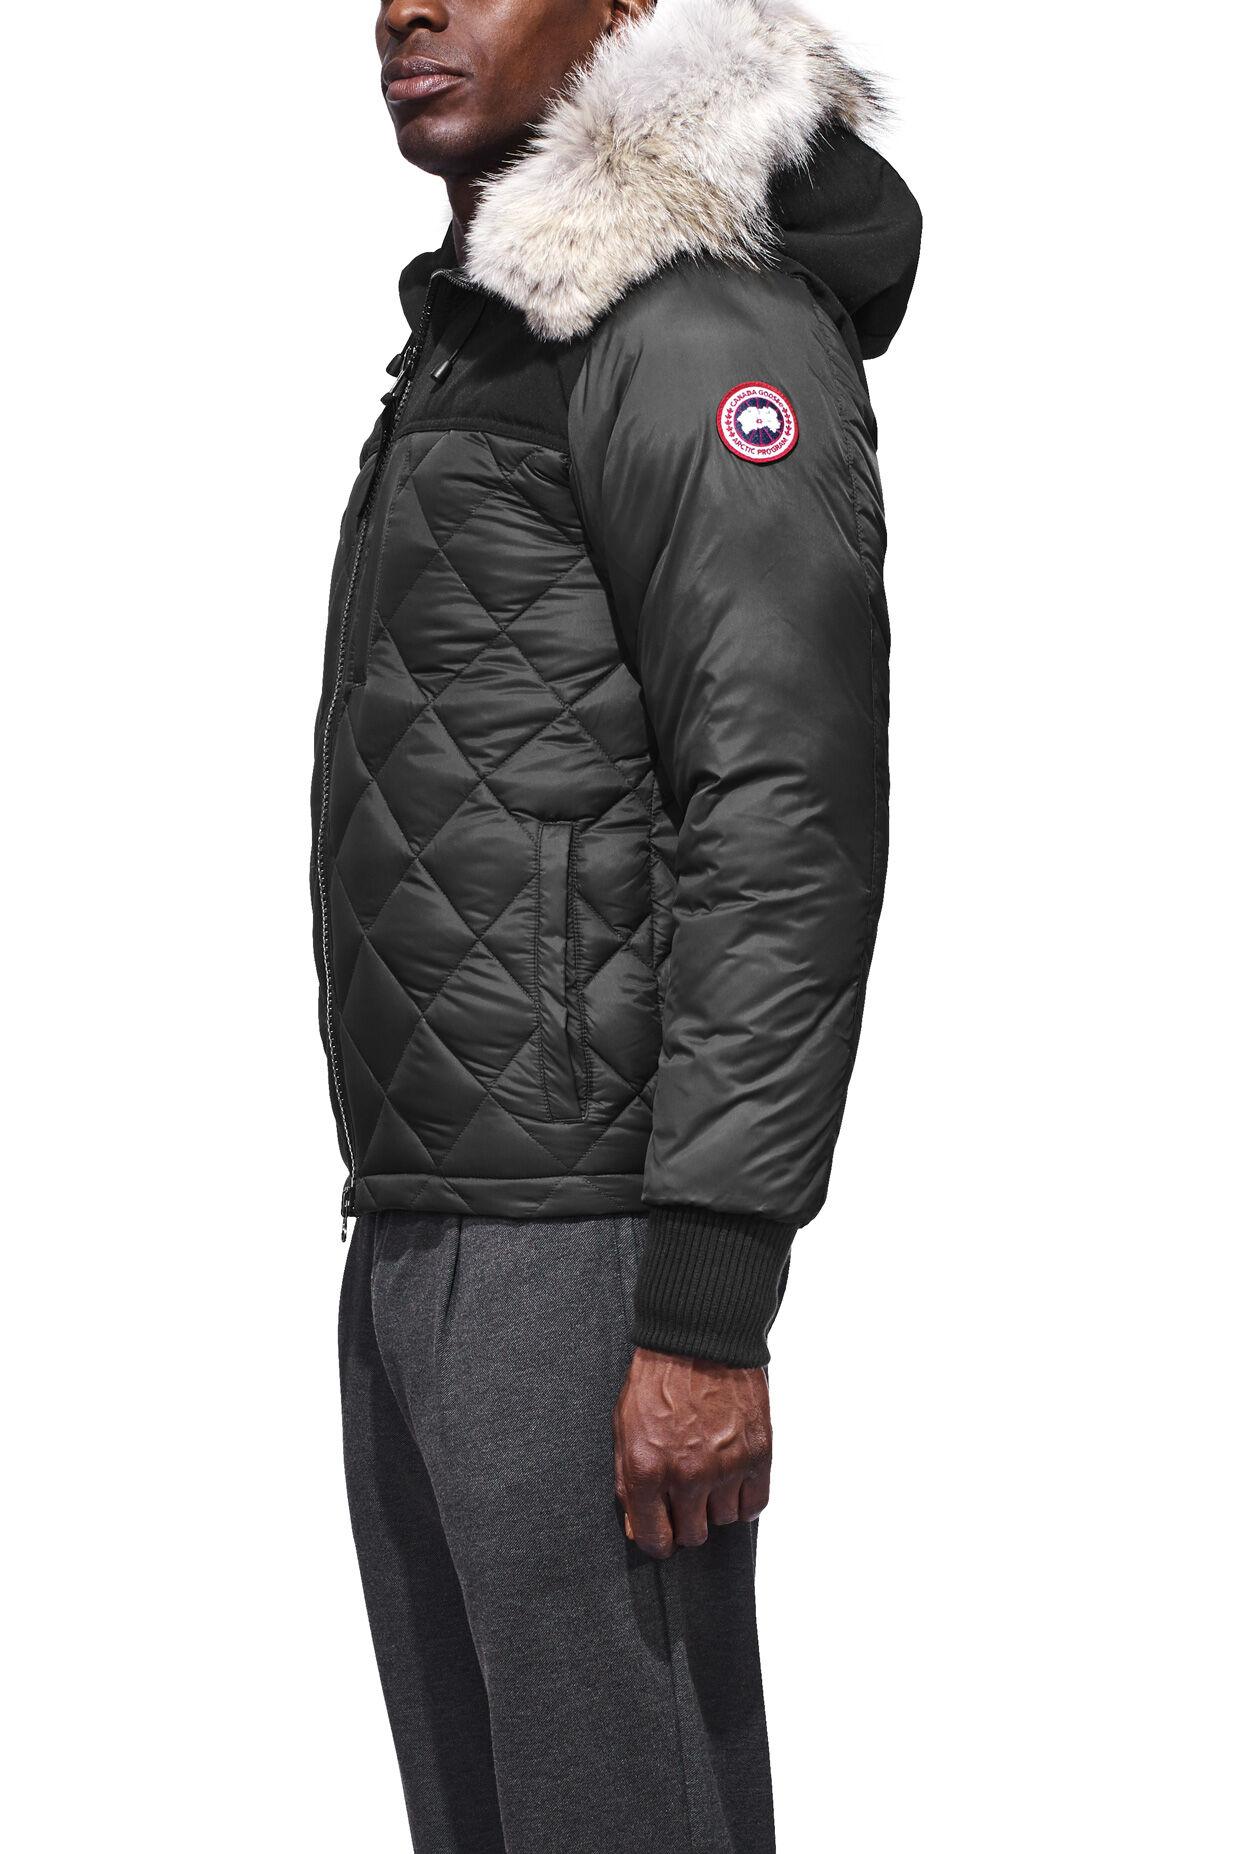 mens coat canada goose